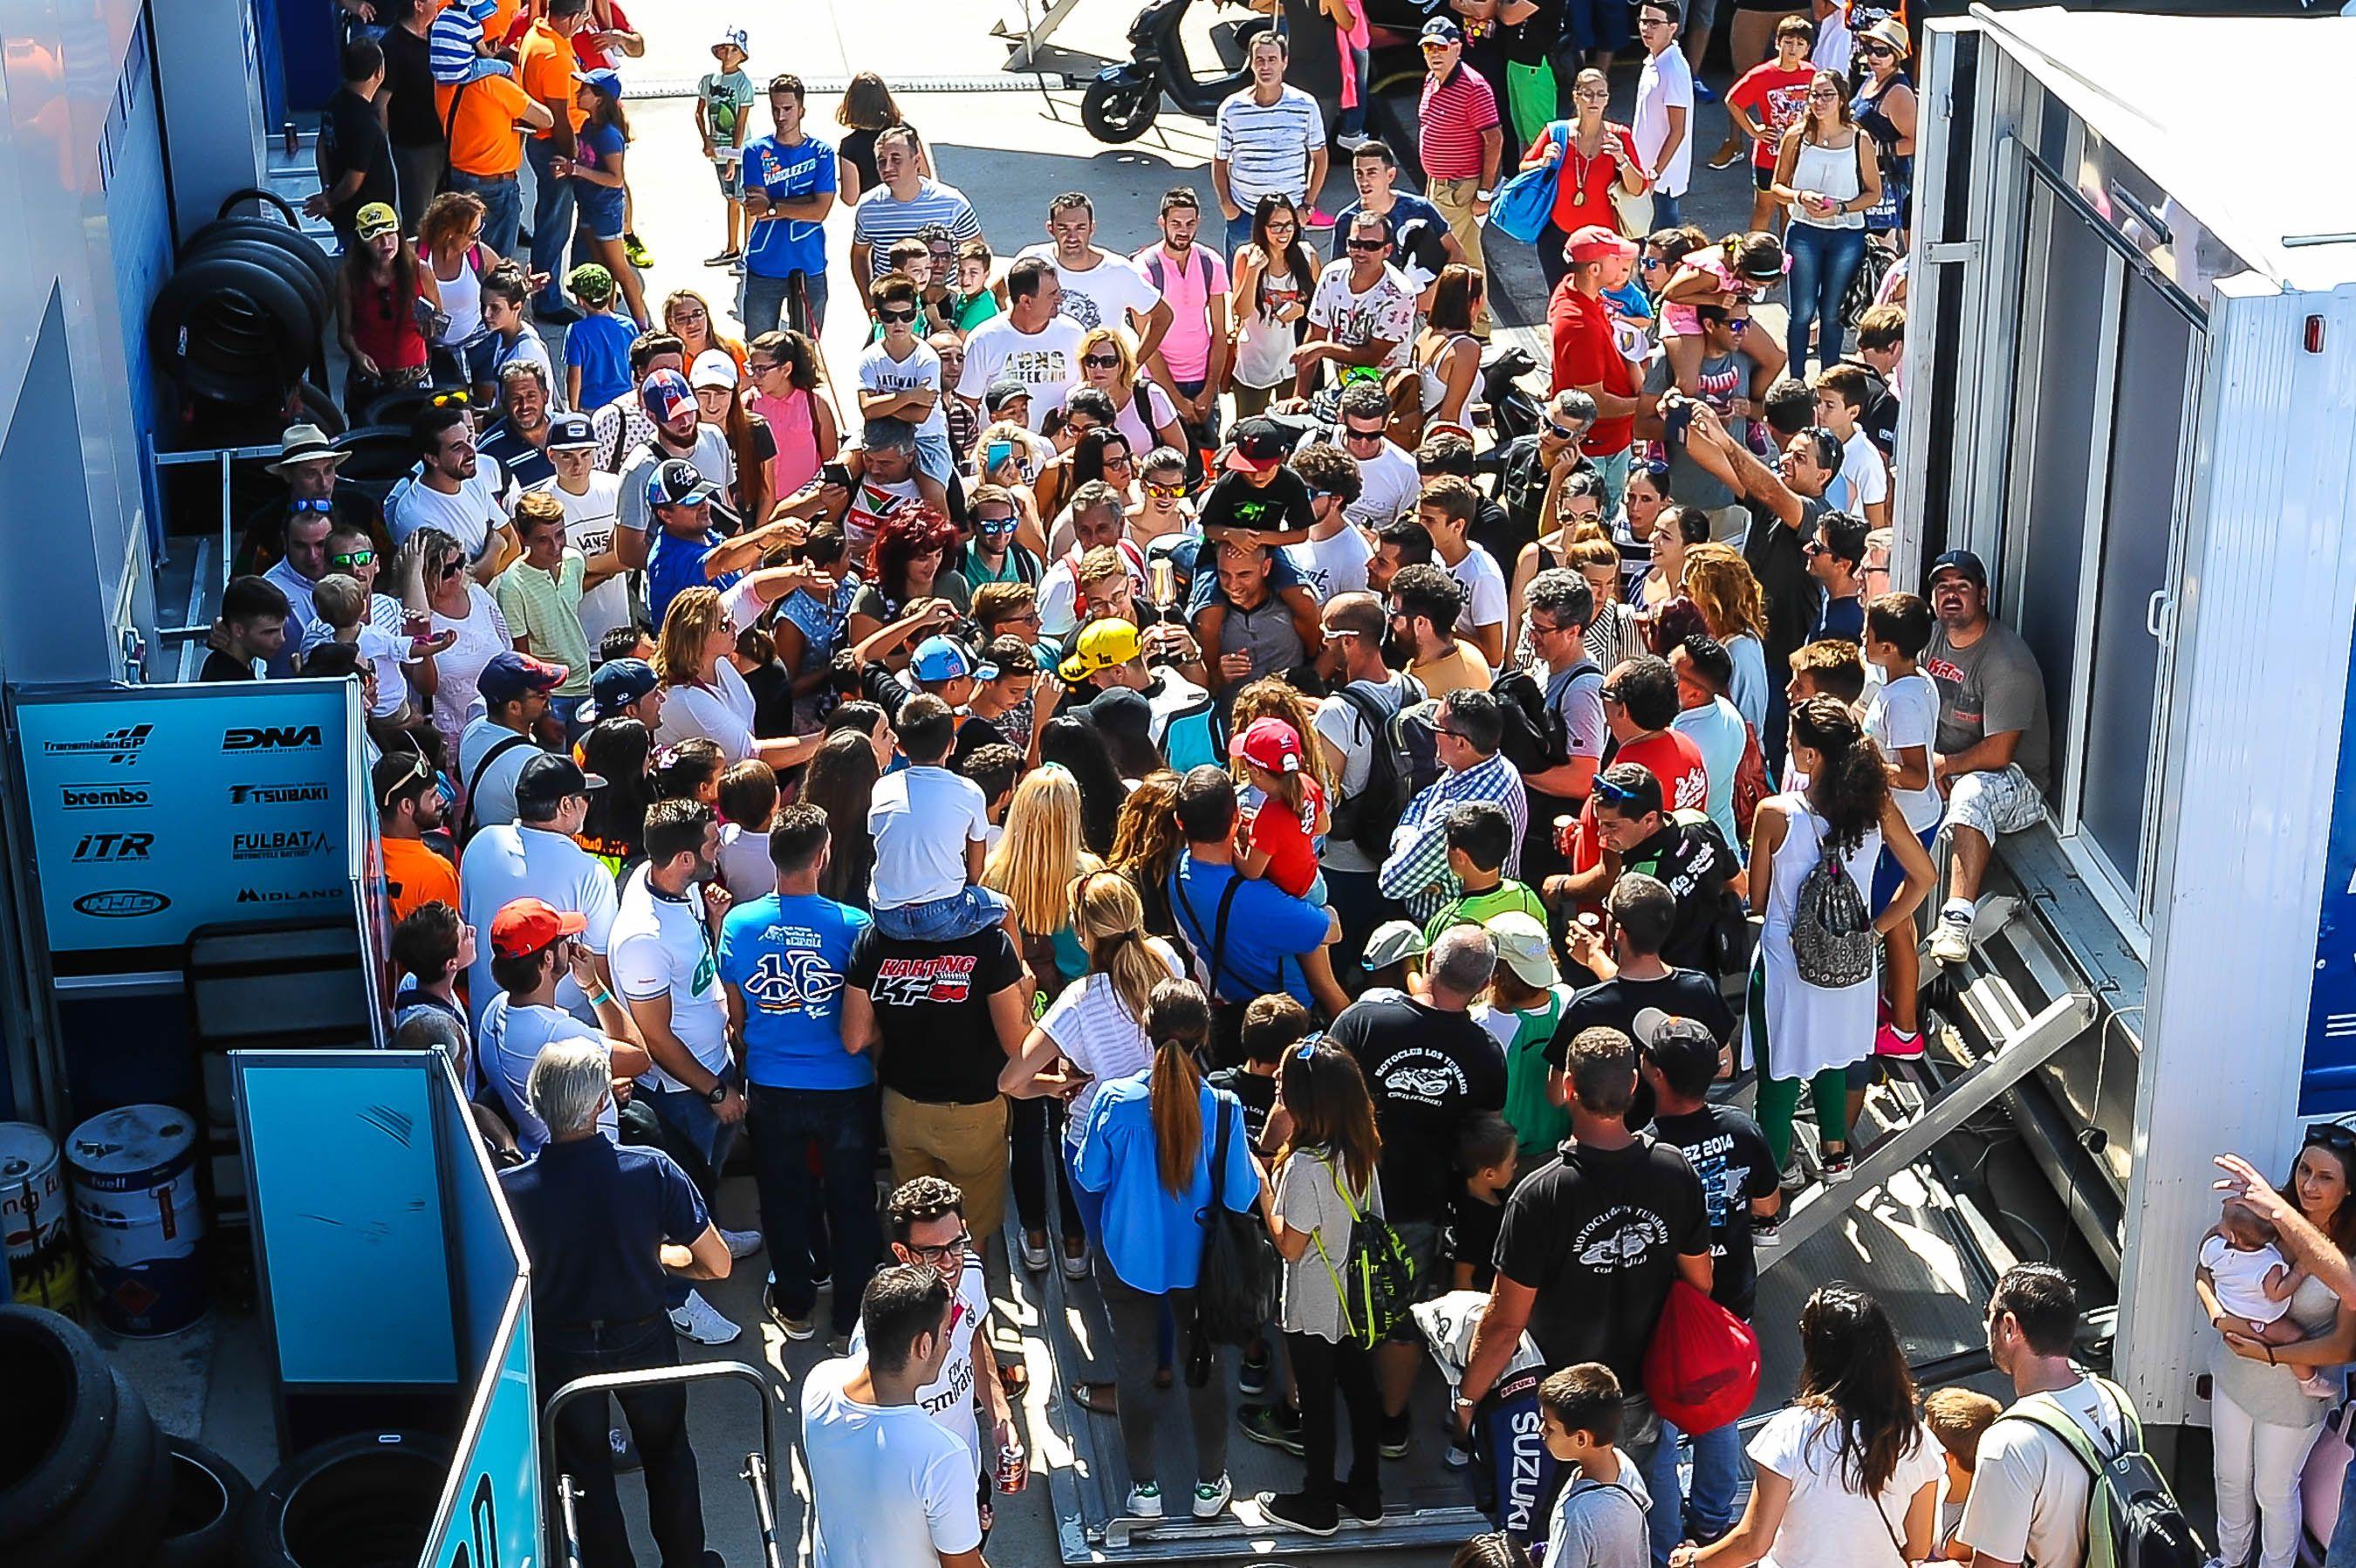 Mucho ambiente en Jerez | Christian Cantizano para MIRA Jerez